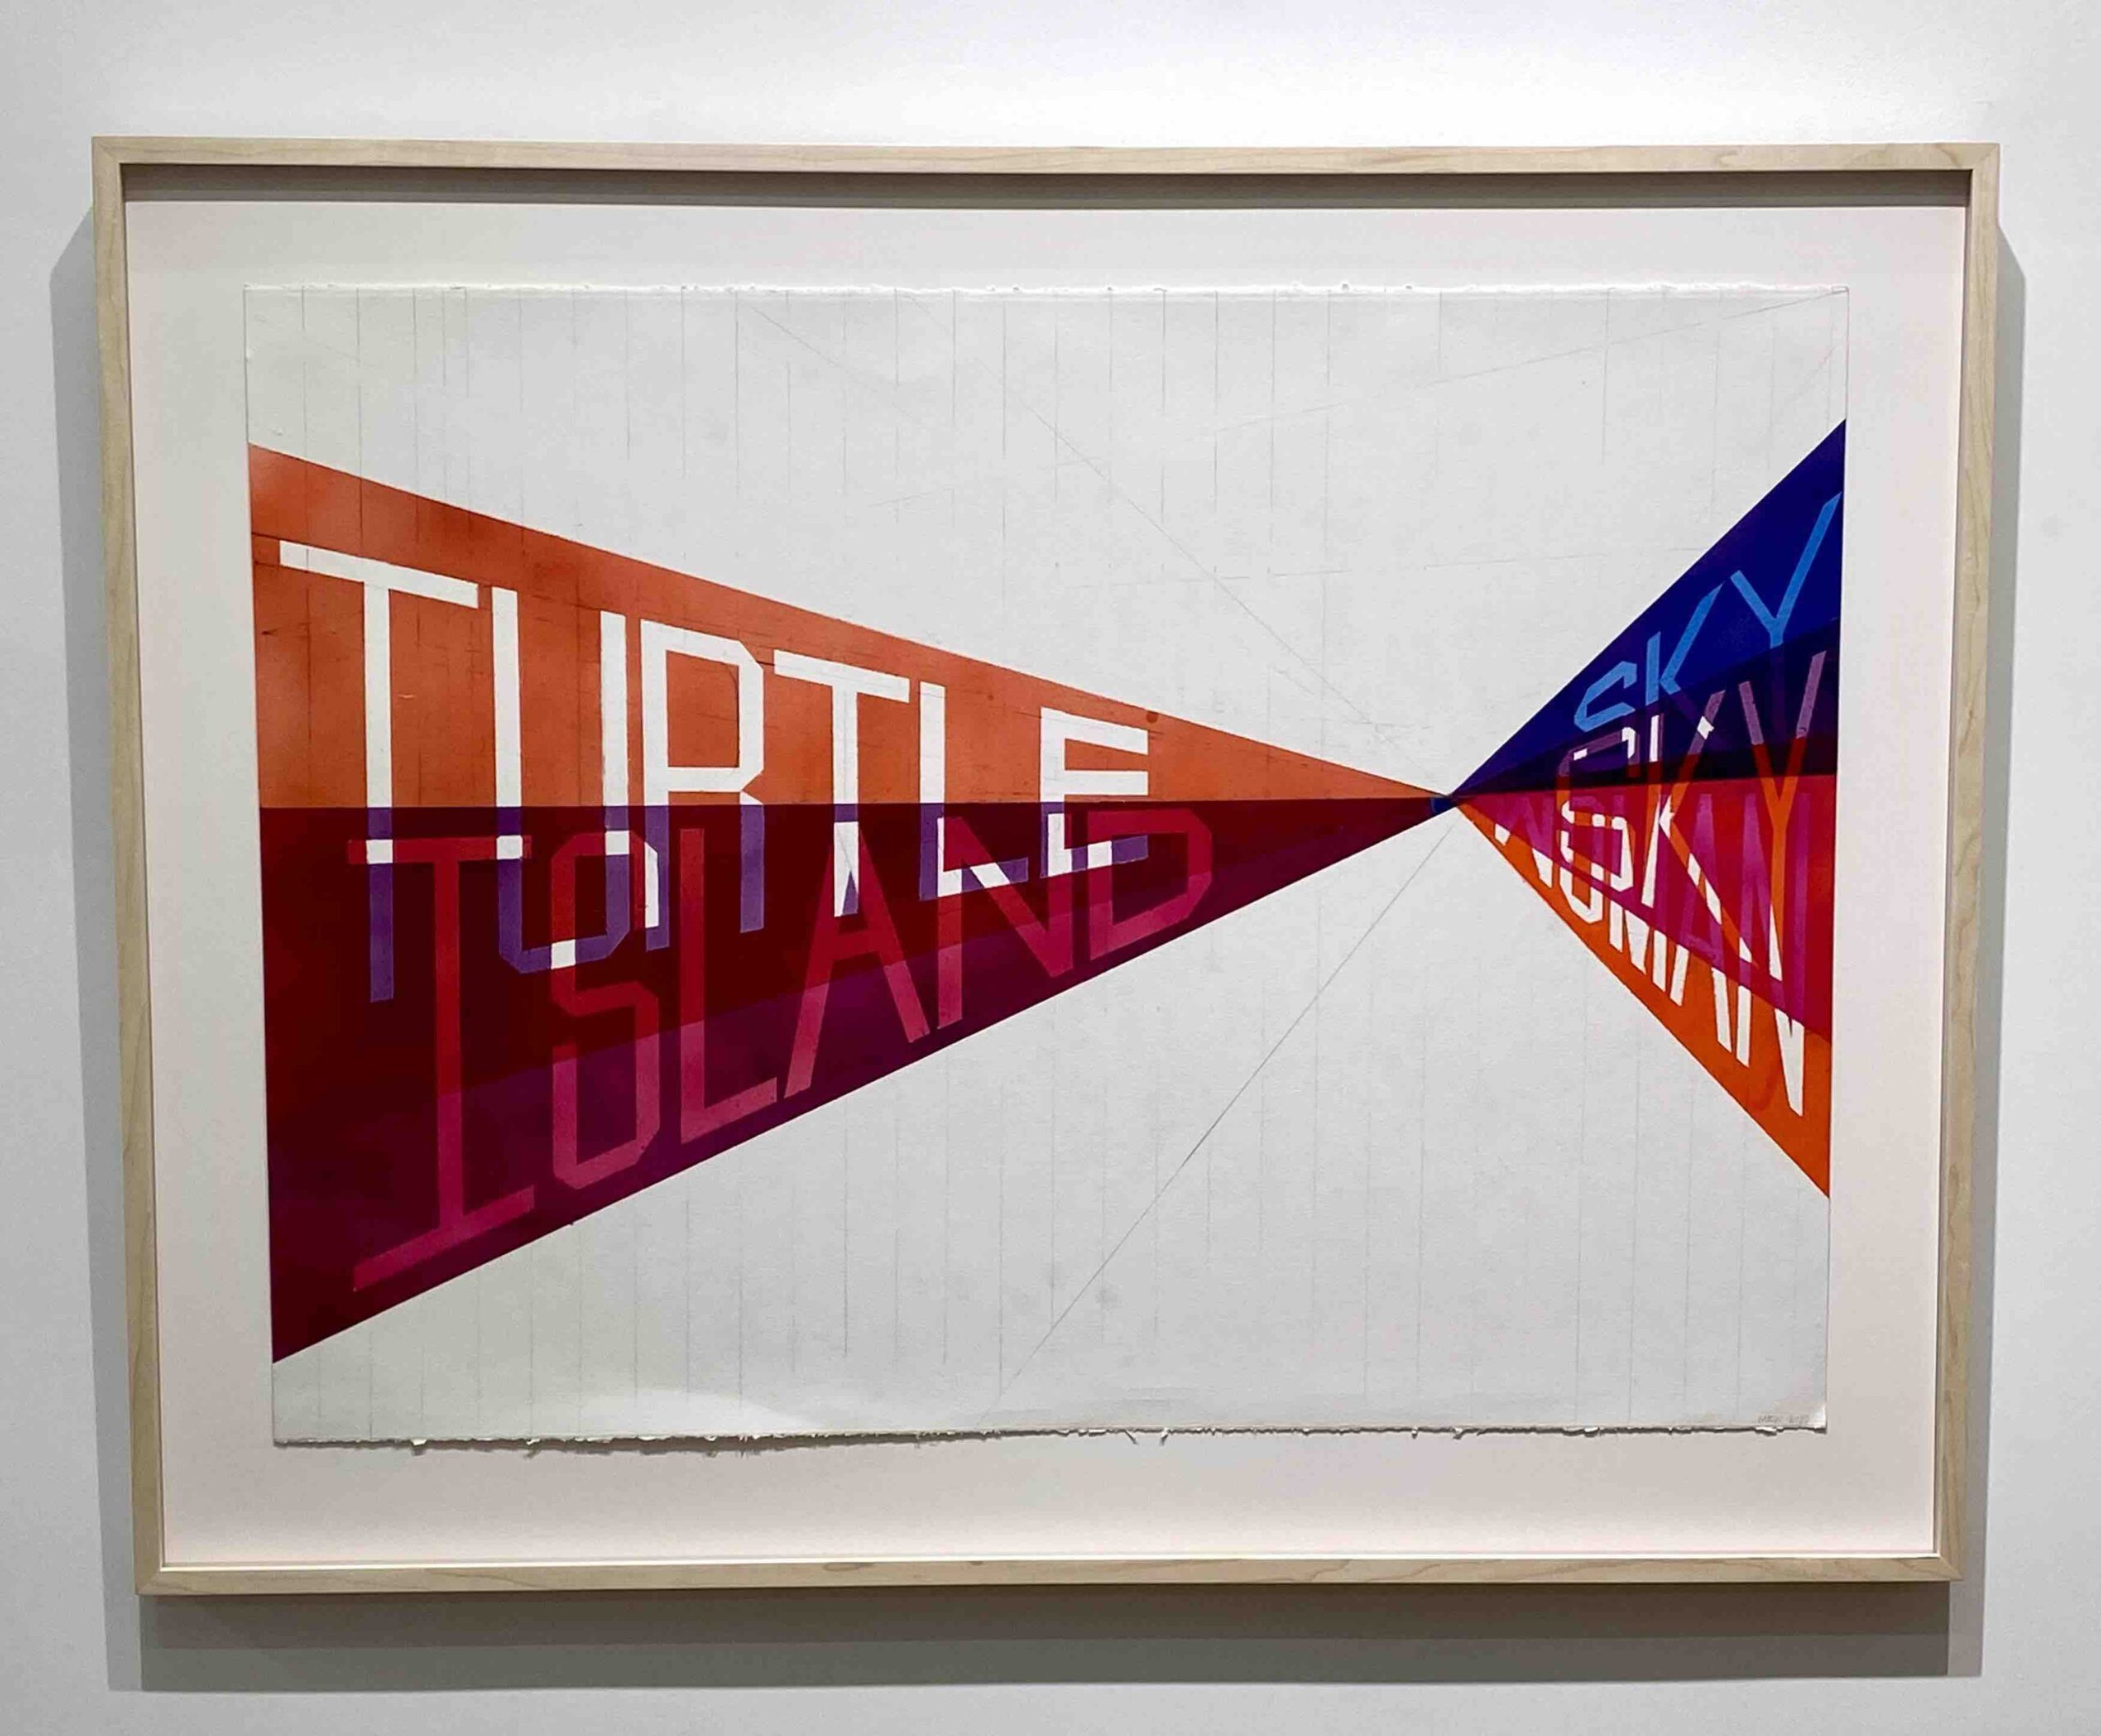 Turtle Island – Marie Watt 2020 Acrylic paint on paper 22 x 30 in 2020 Marc Straus Gallery